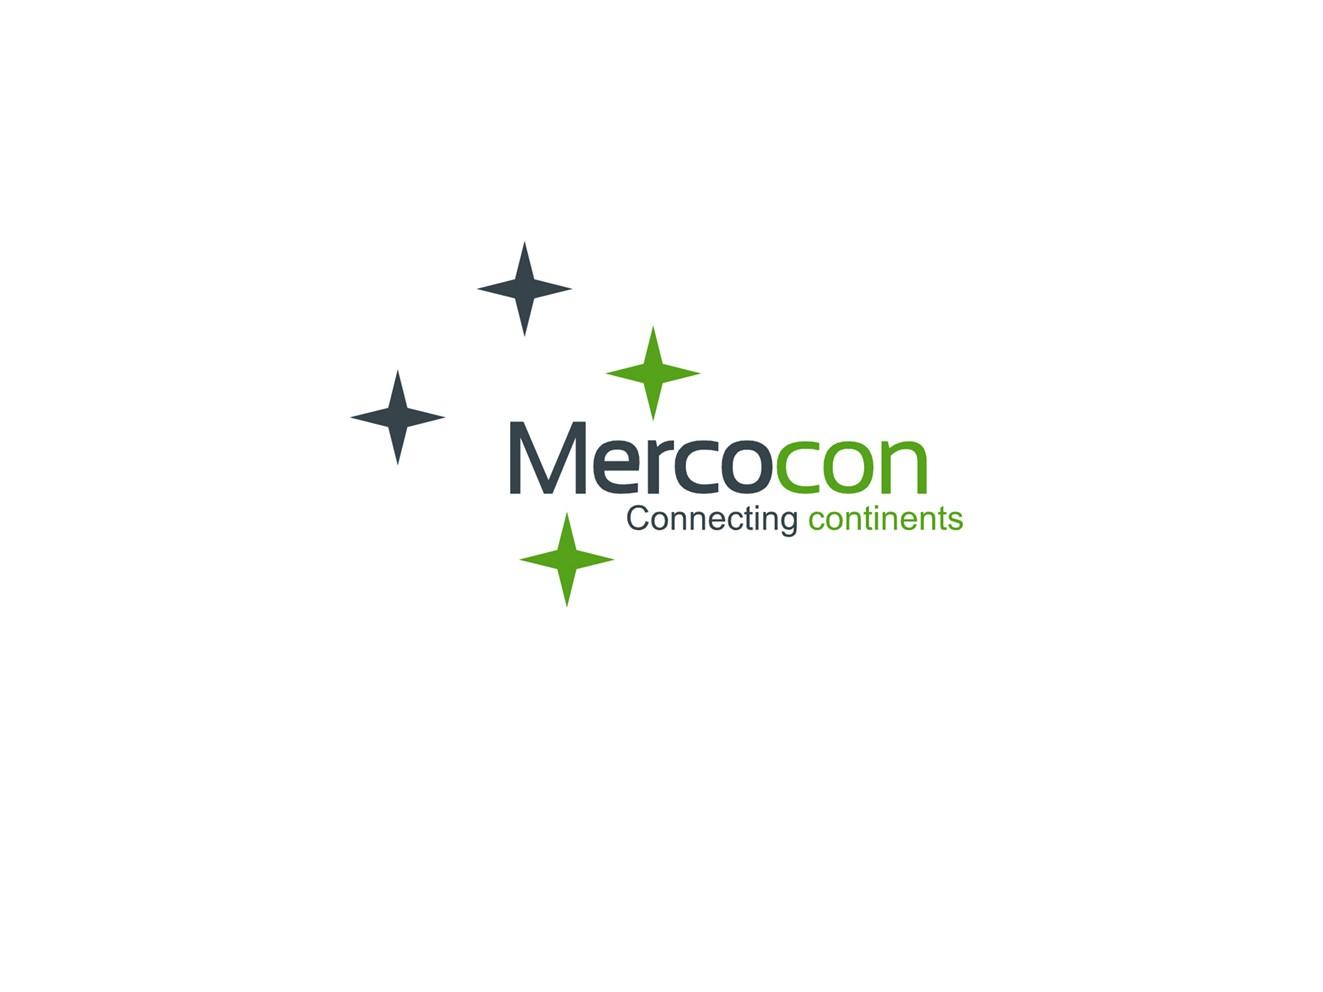 Sycor ist Partner der Mercocon GmbH & Co. KG